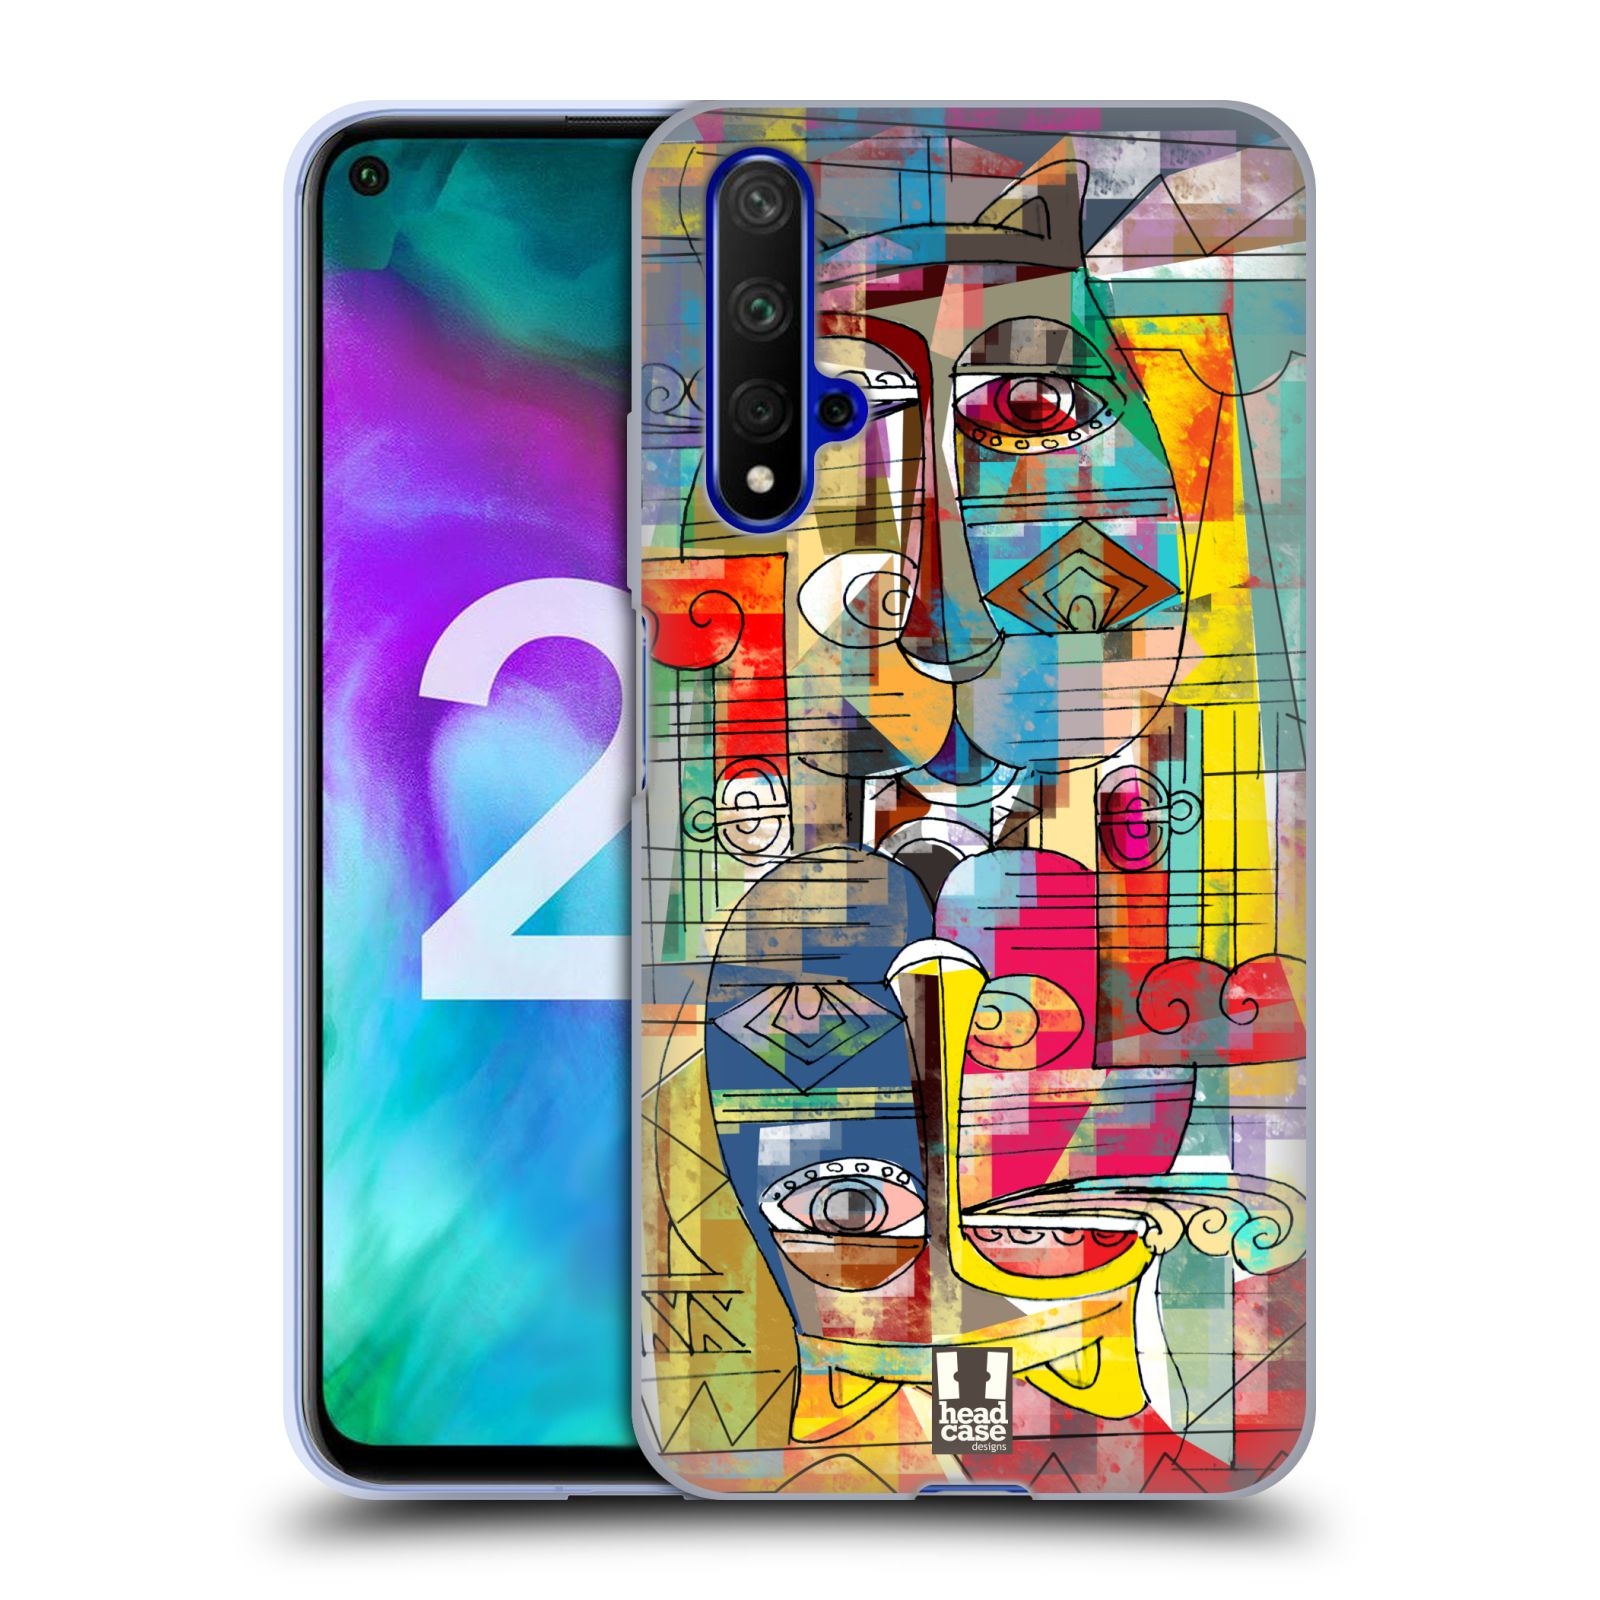 Silikonové pouzdro na mobil Honor 20 - Head Case - AZTEC MANX